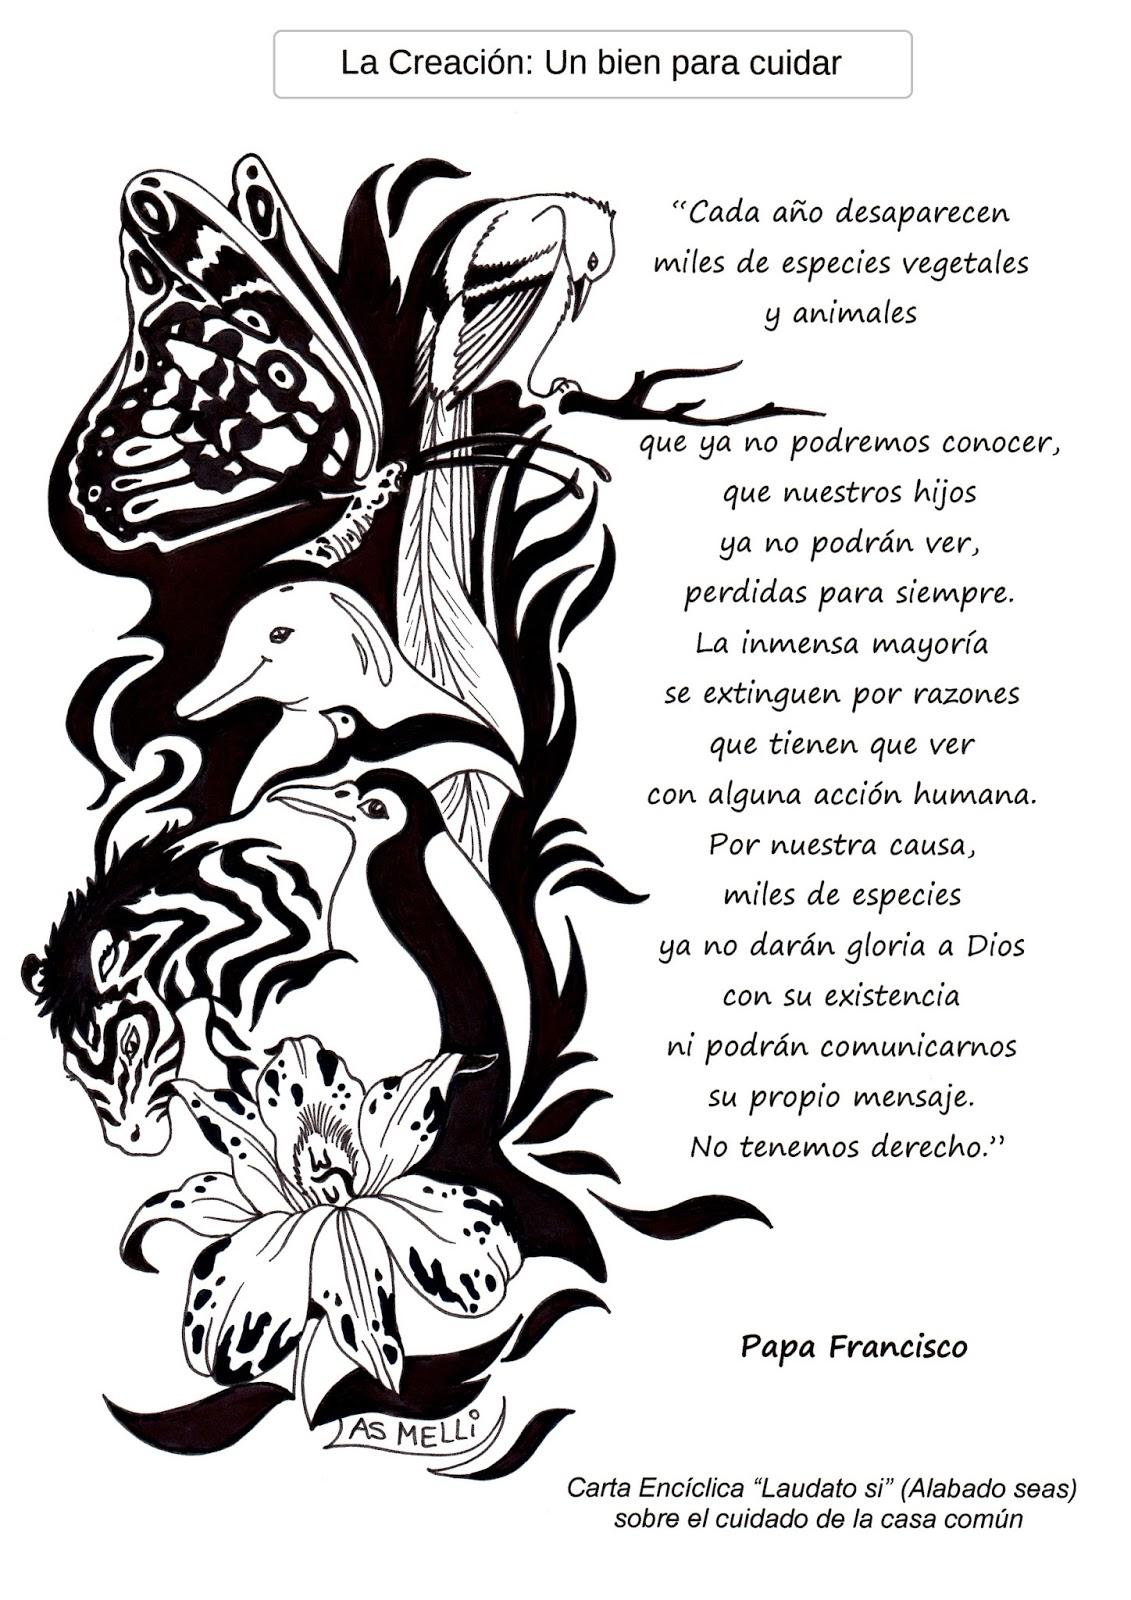 La Catequesis El Blog De Sandra Recursos Catequesis La